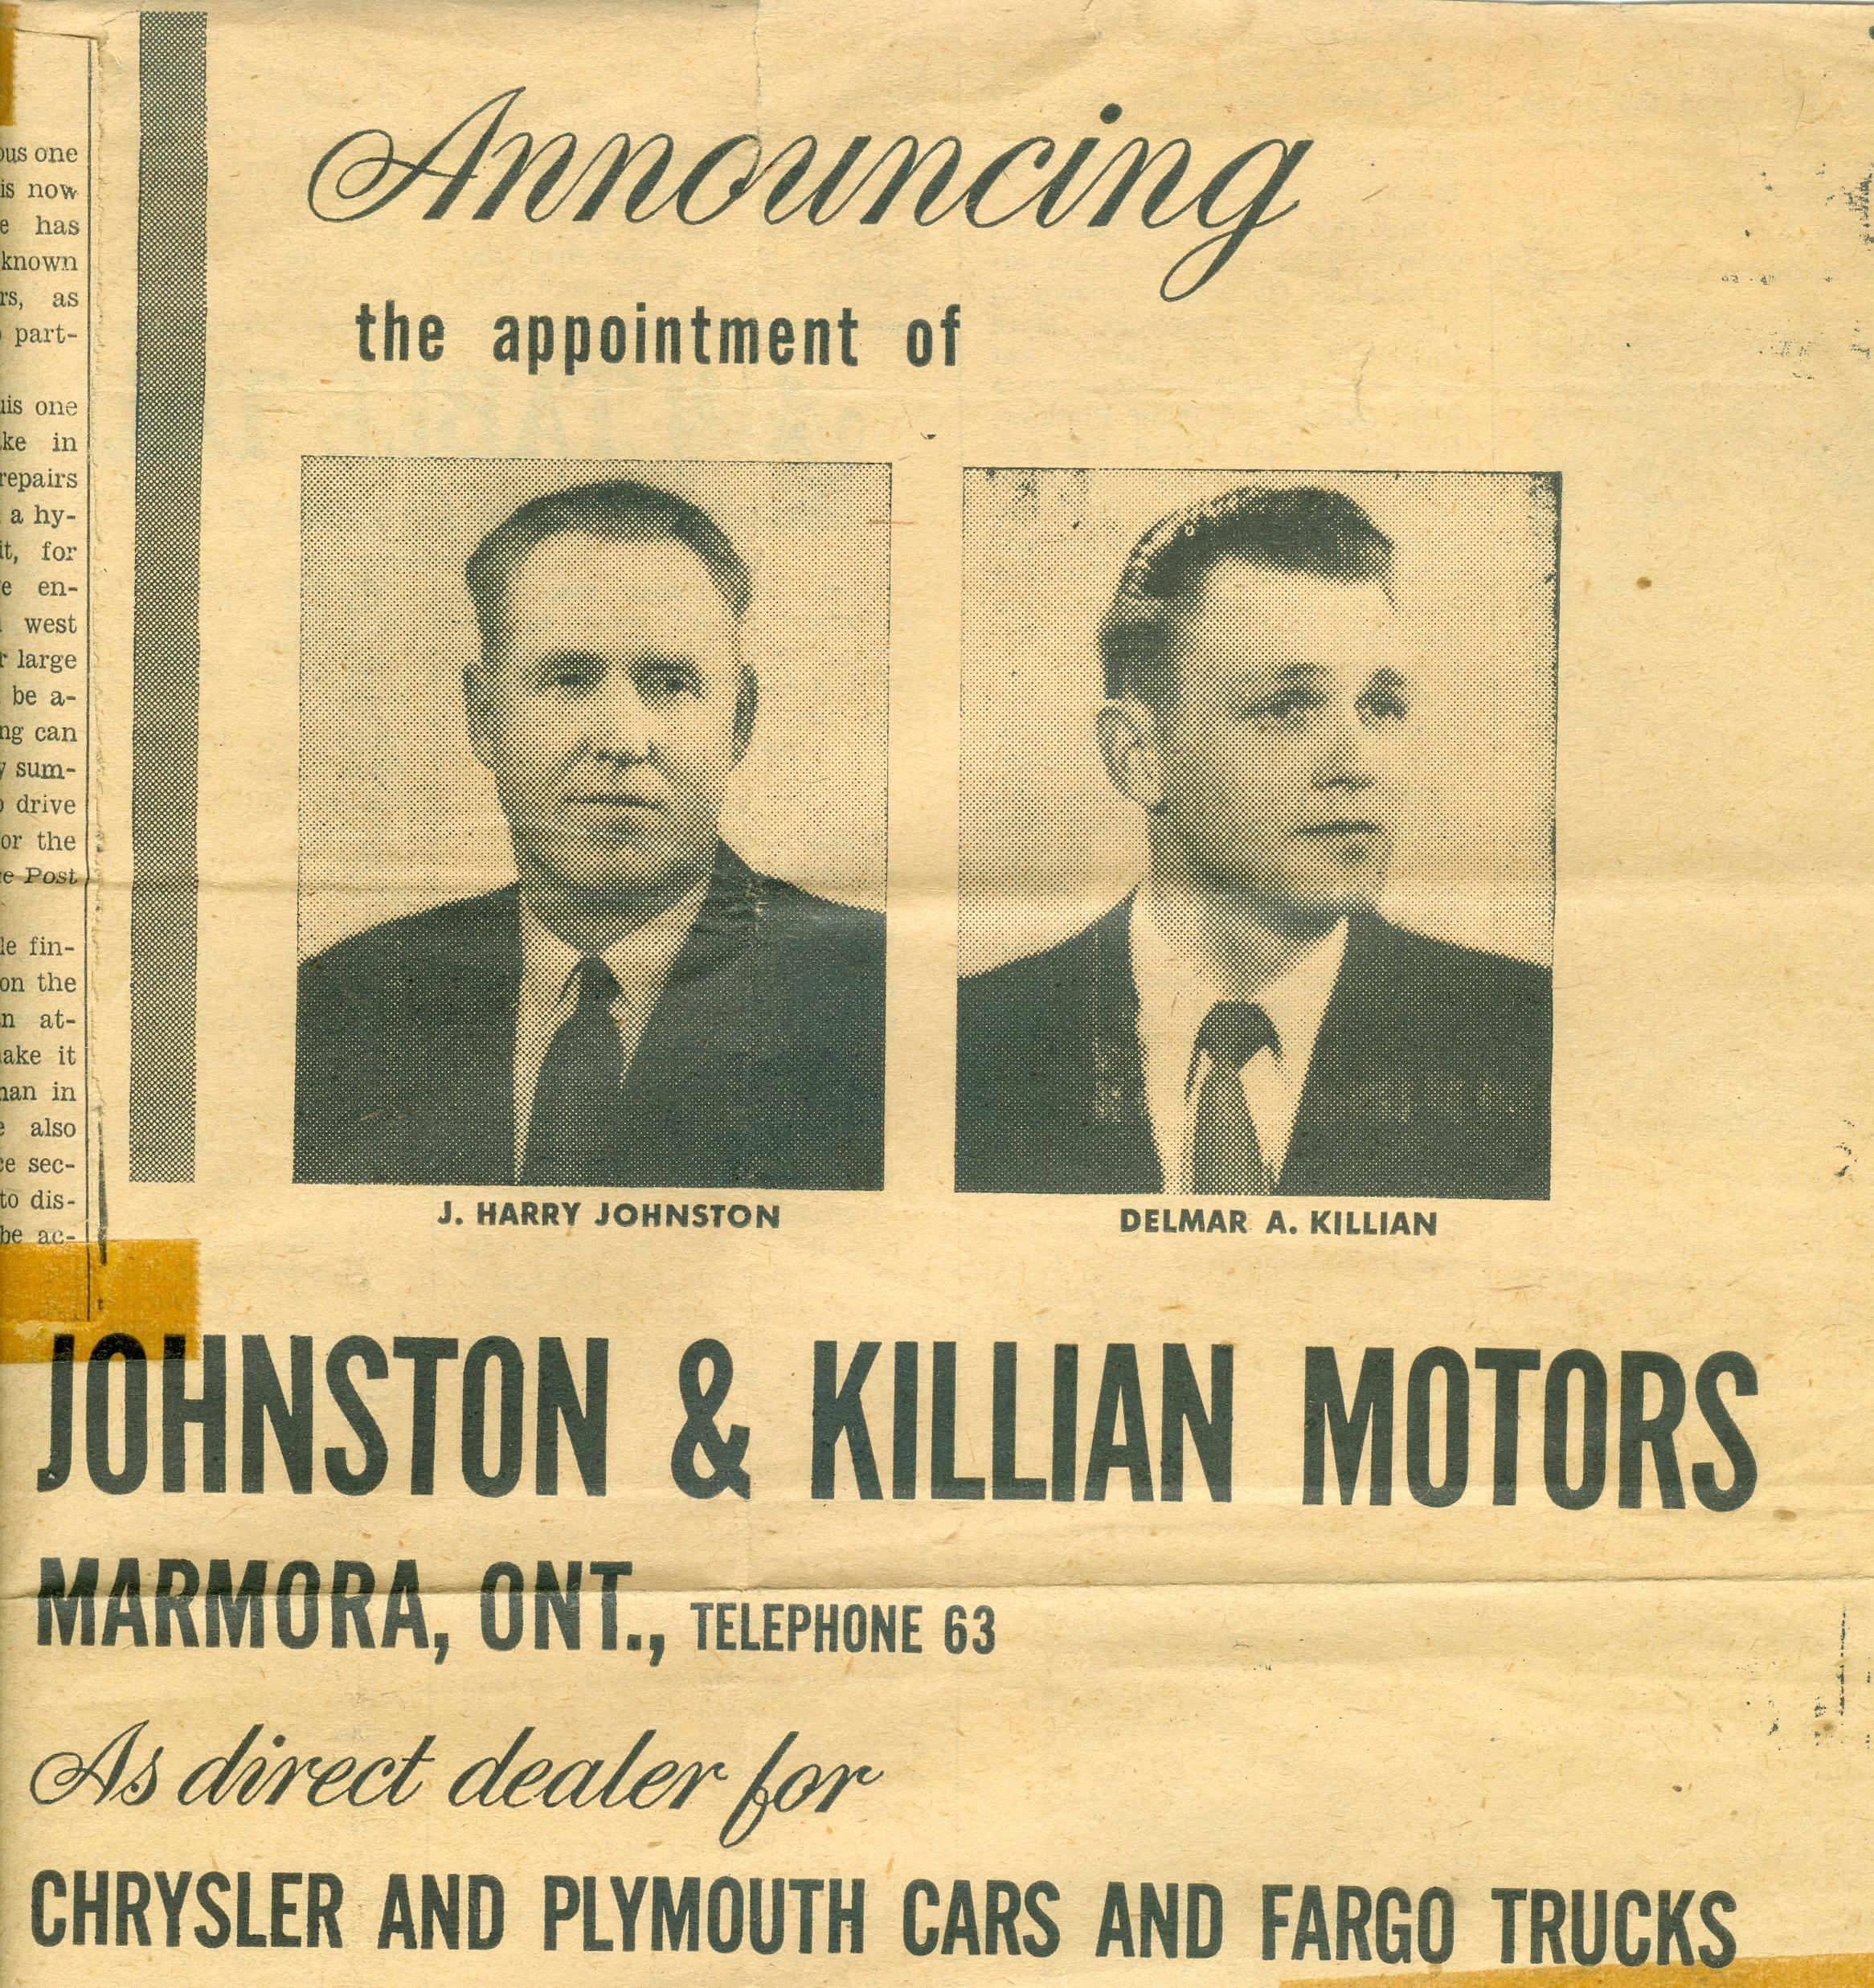 Johnston-Killian garage-dealership (4).jpg